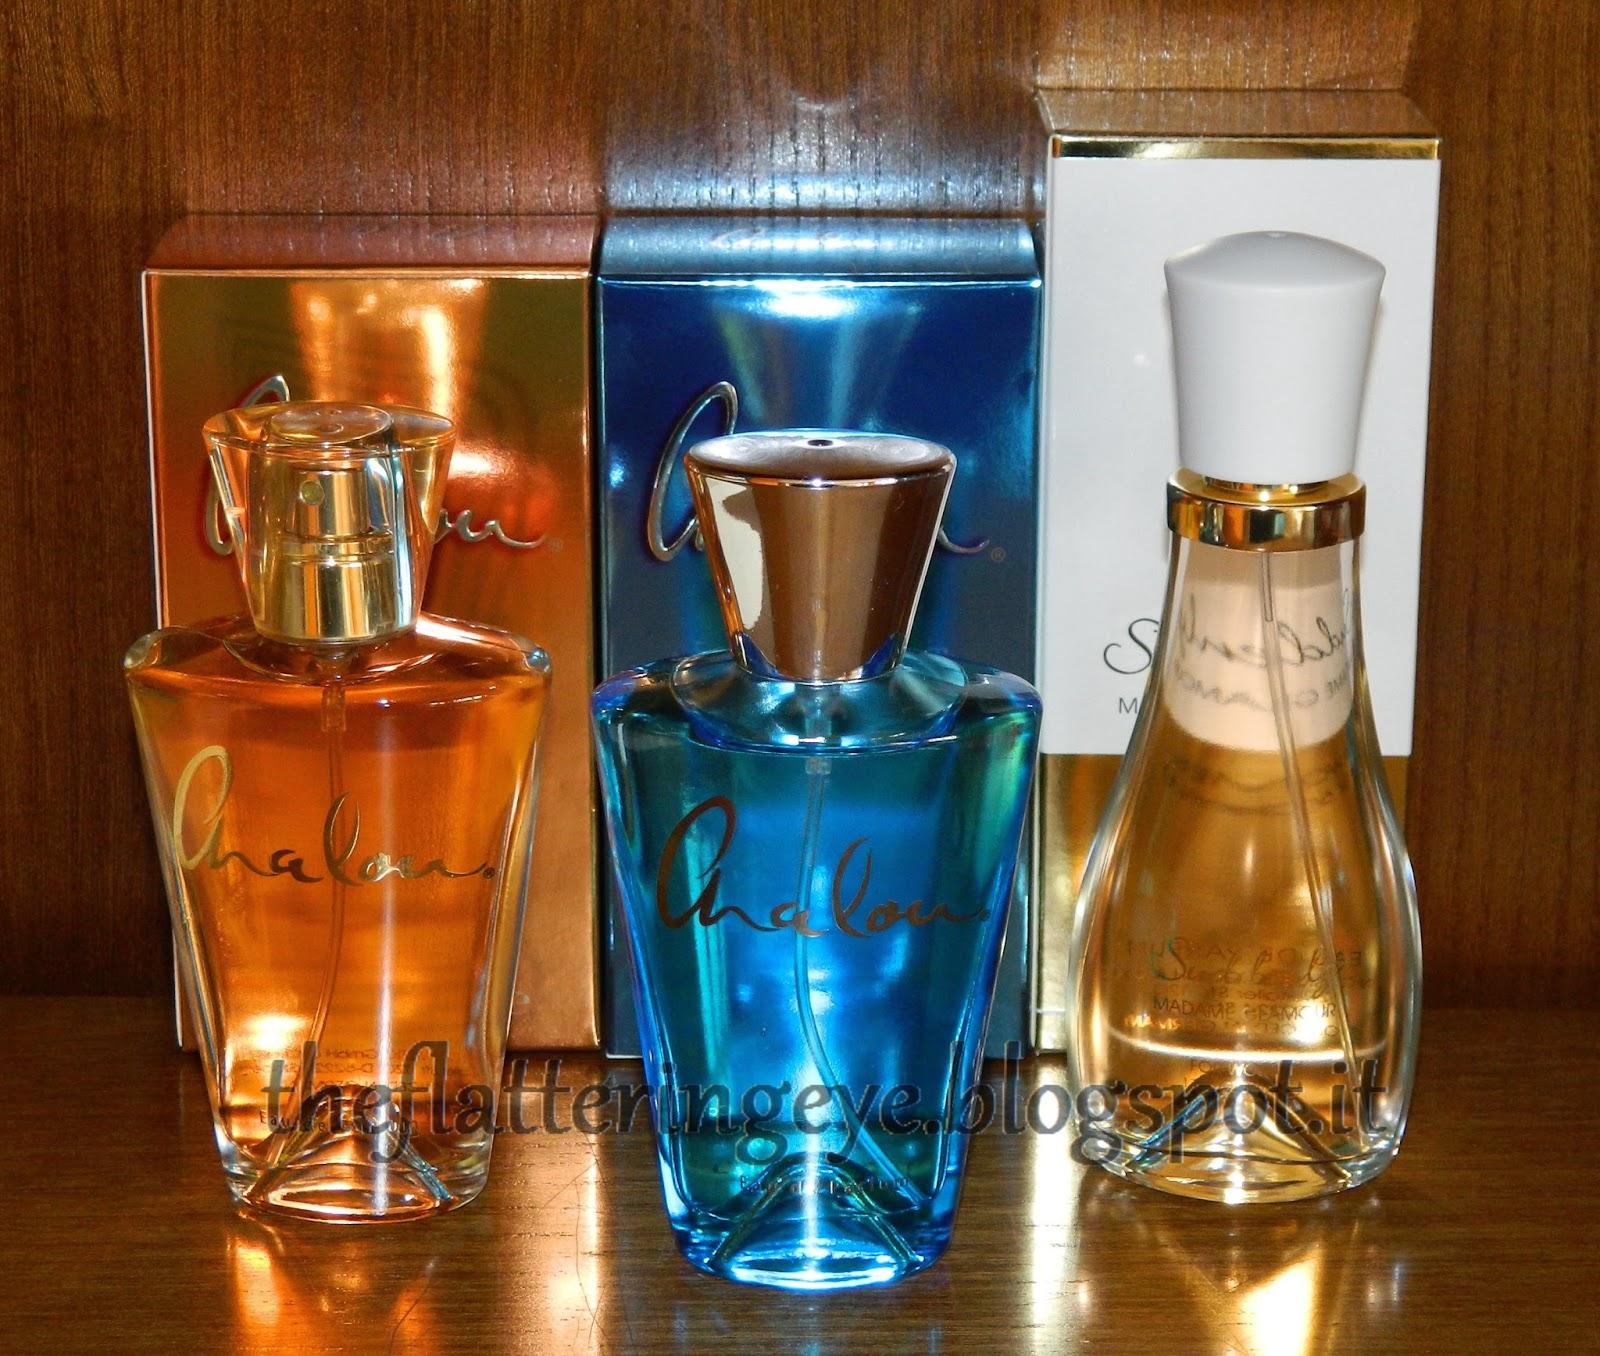 Madame dior perfume